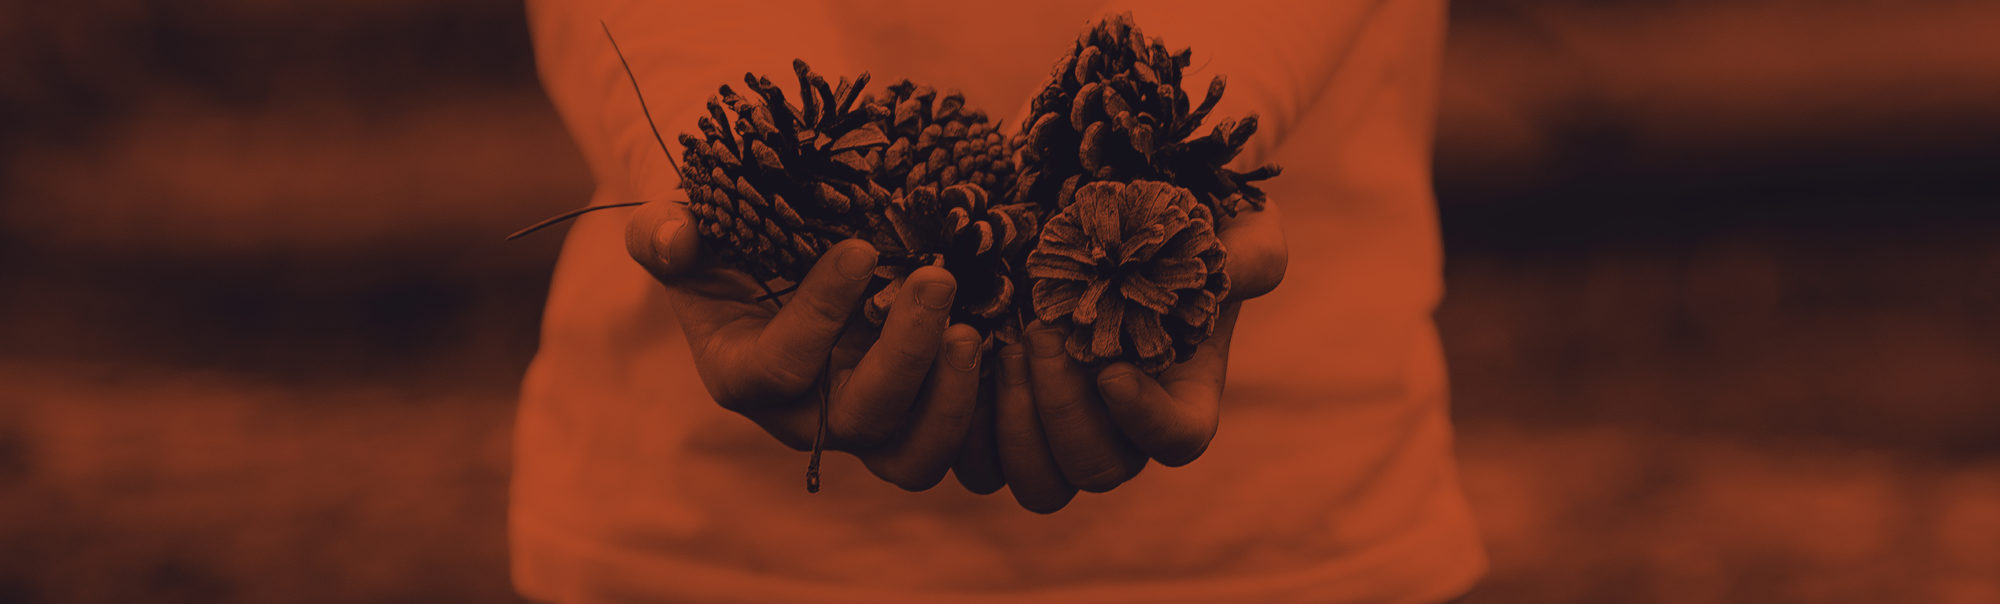 3 Ways to Be Generous | Bobby McGraw [sermon replay]